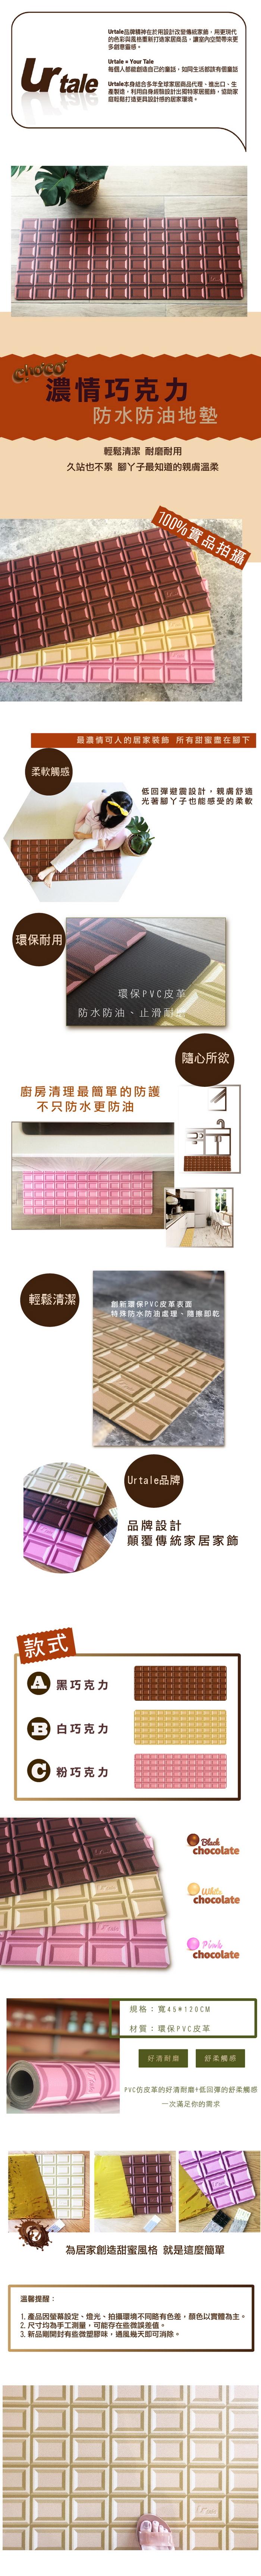 Urtale|濃情巧克力防水廚房地墊